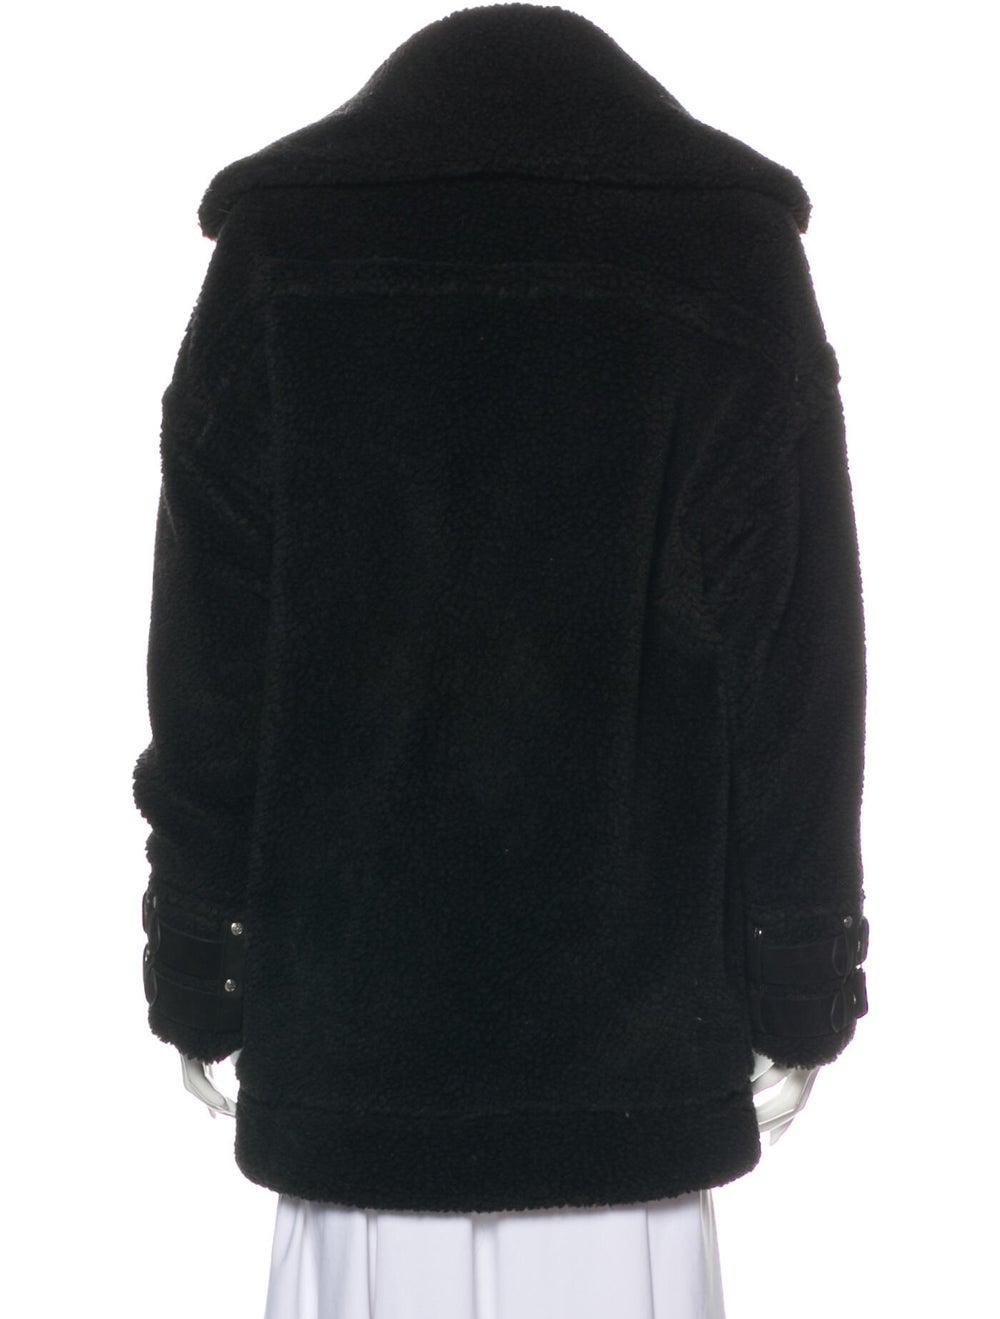 Anine Bing Coat Black - image 3